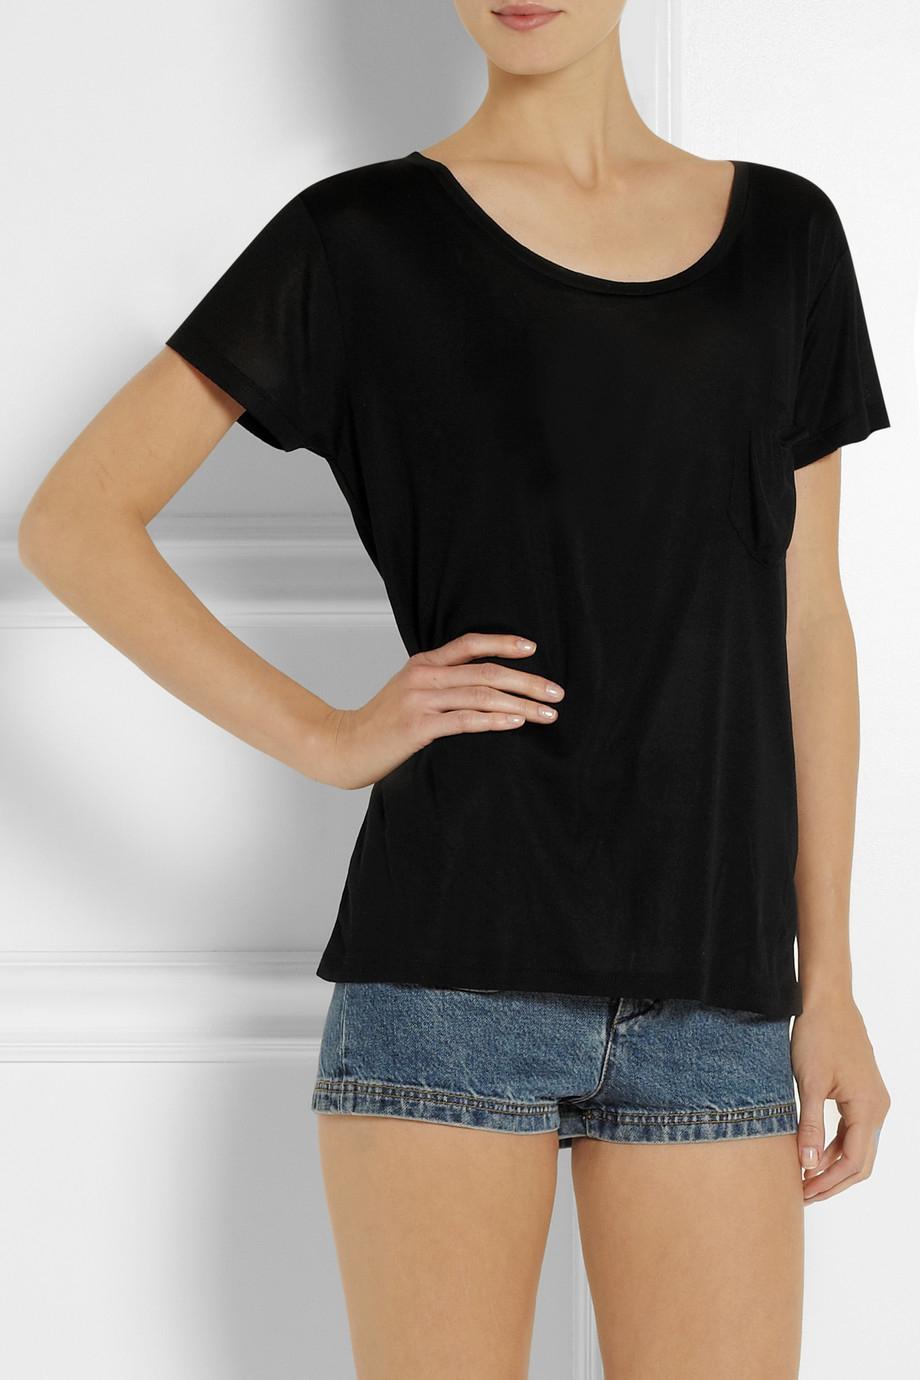 lyst saint laurent silk jersey t shirt in black. Black Bedroom Furniture Sets. Home Design Ideas